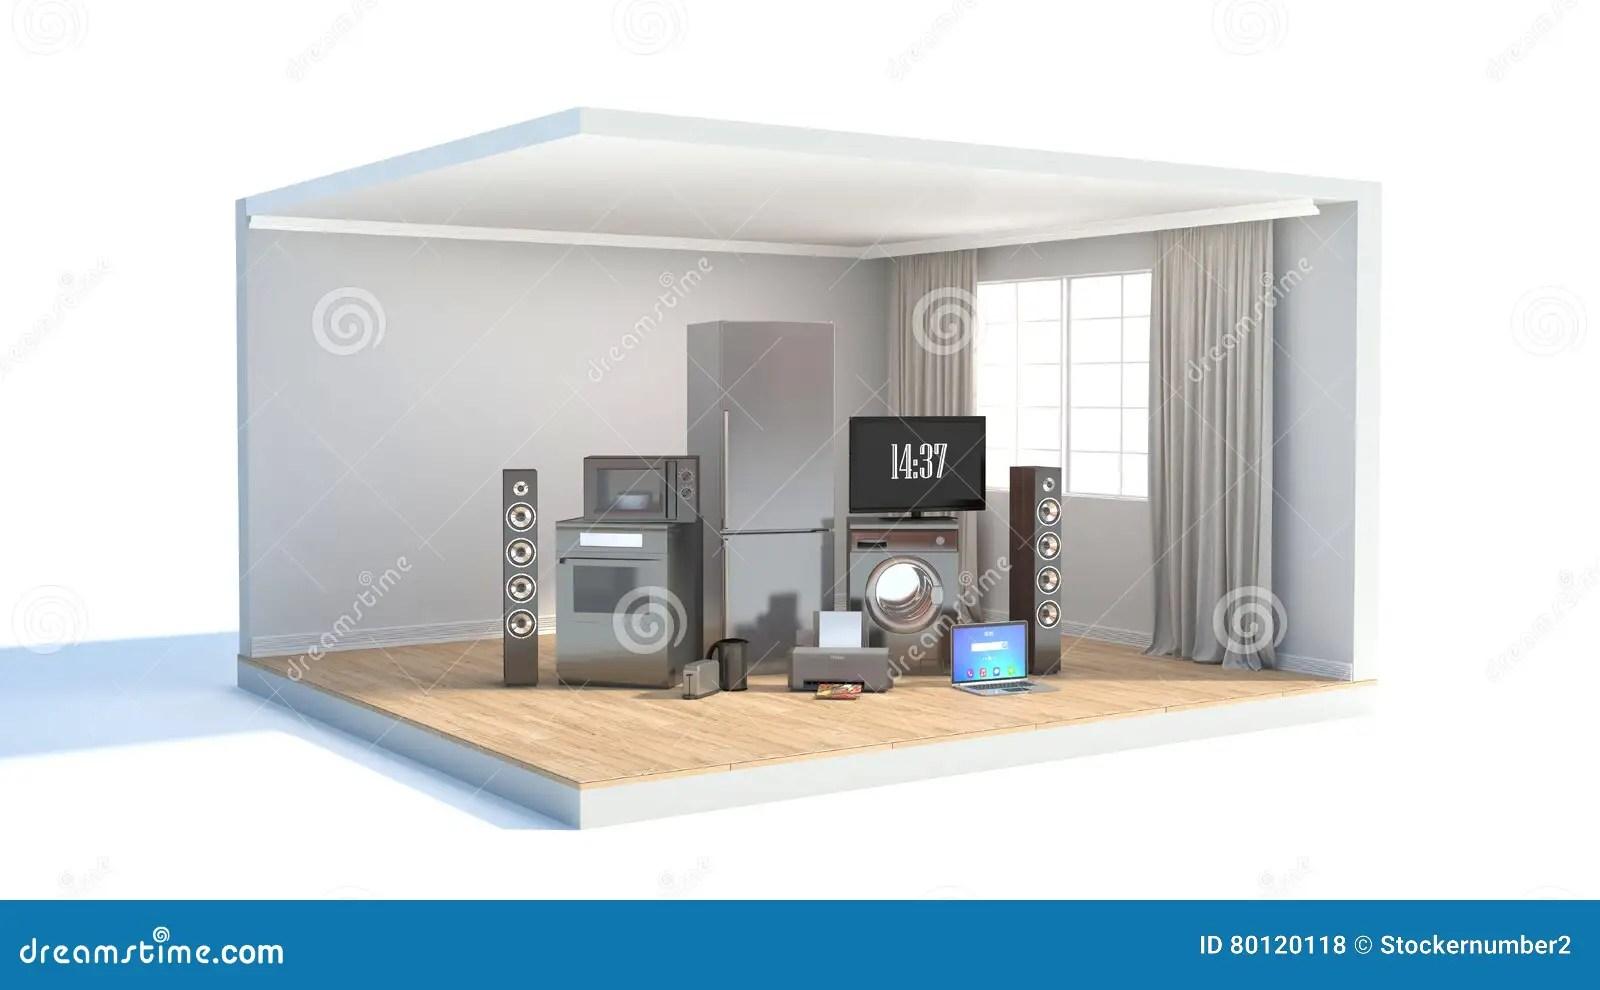 kitchen design tools metal canisters 工具设计家图标厨房设置了您煤气灶 电视戏院 冰箱空气conditi 库存例证 冰箱空气